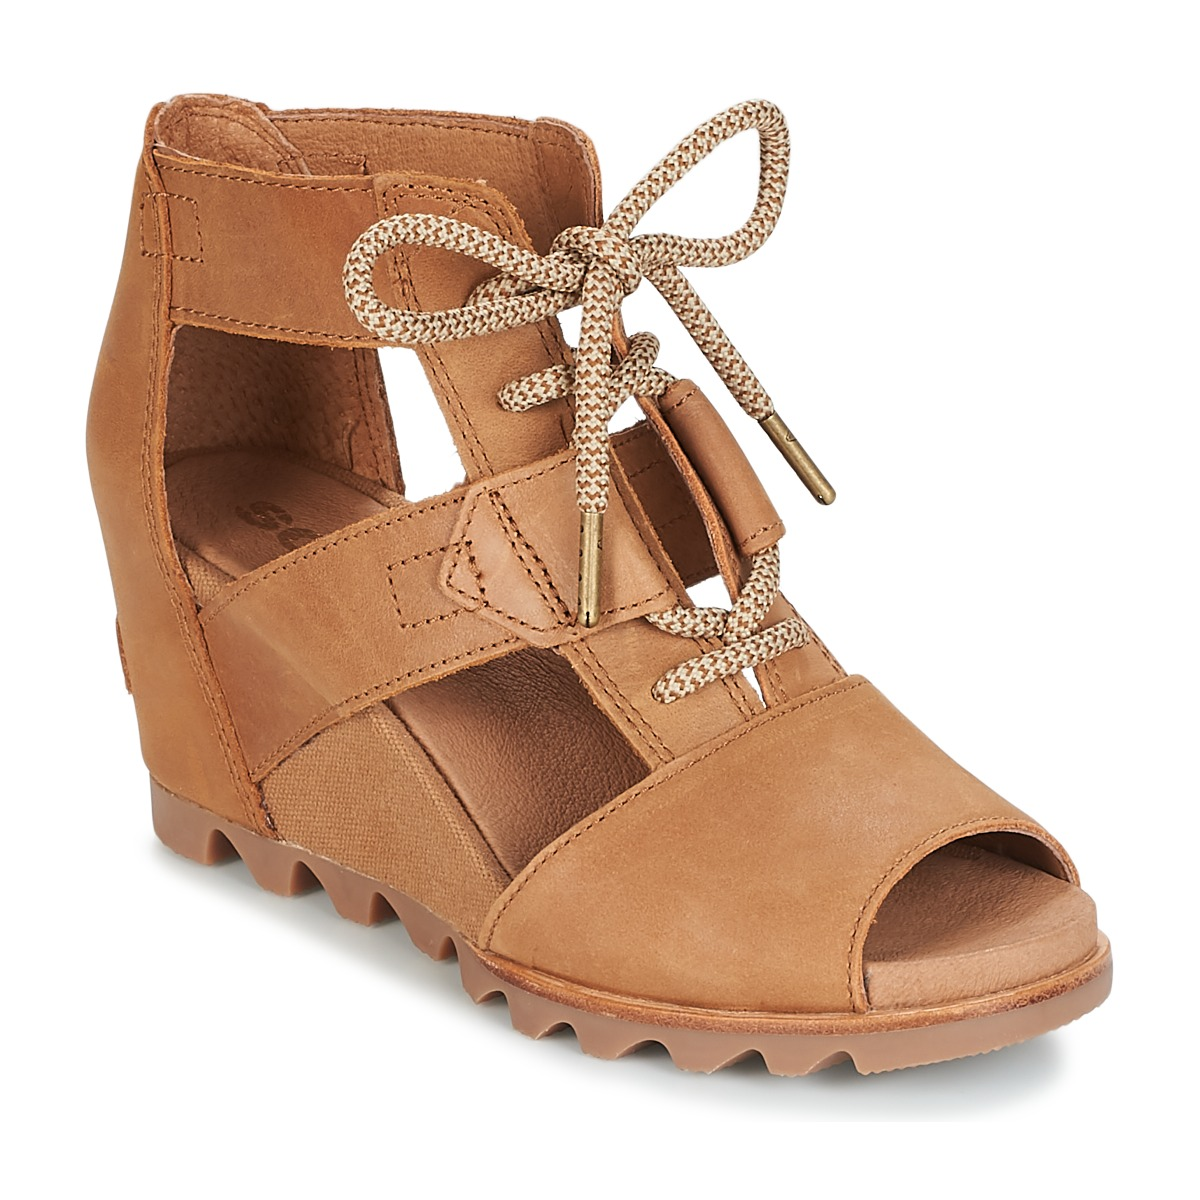 Sorel JOANIE™ LACE Braun - Kostenloser Versand bei Spartoode ! - Schuhe Sandalen / Sandaletten Damen 96,00 €